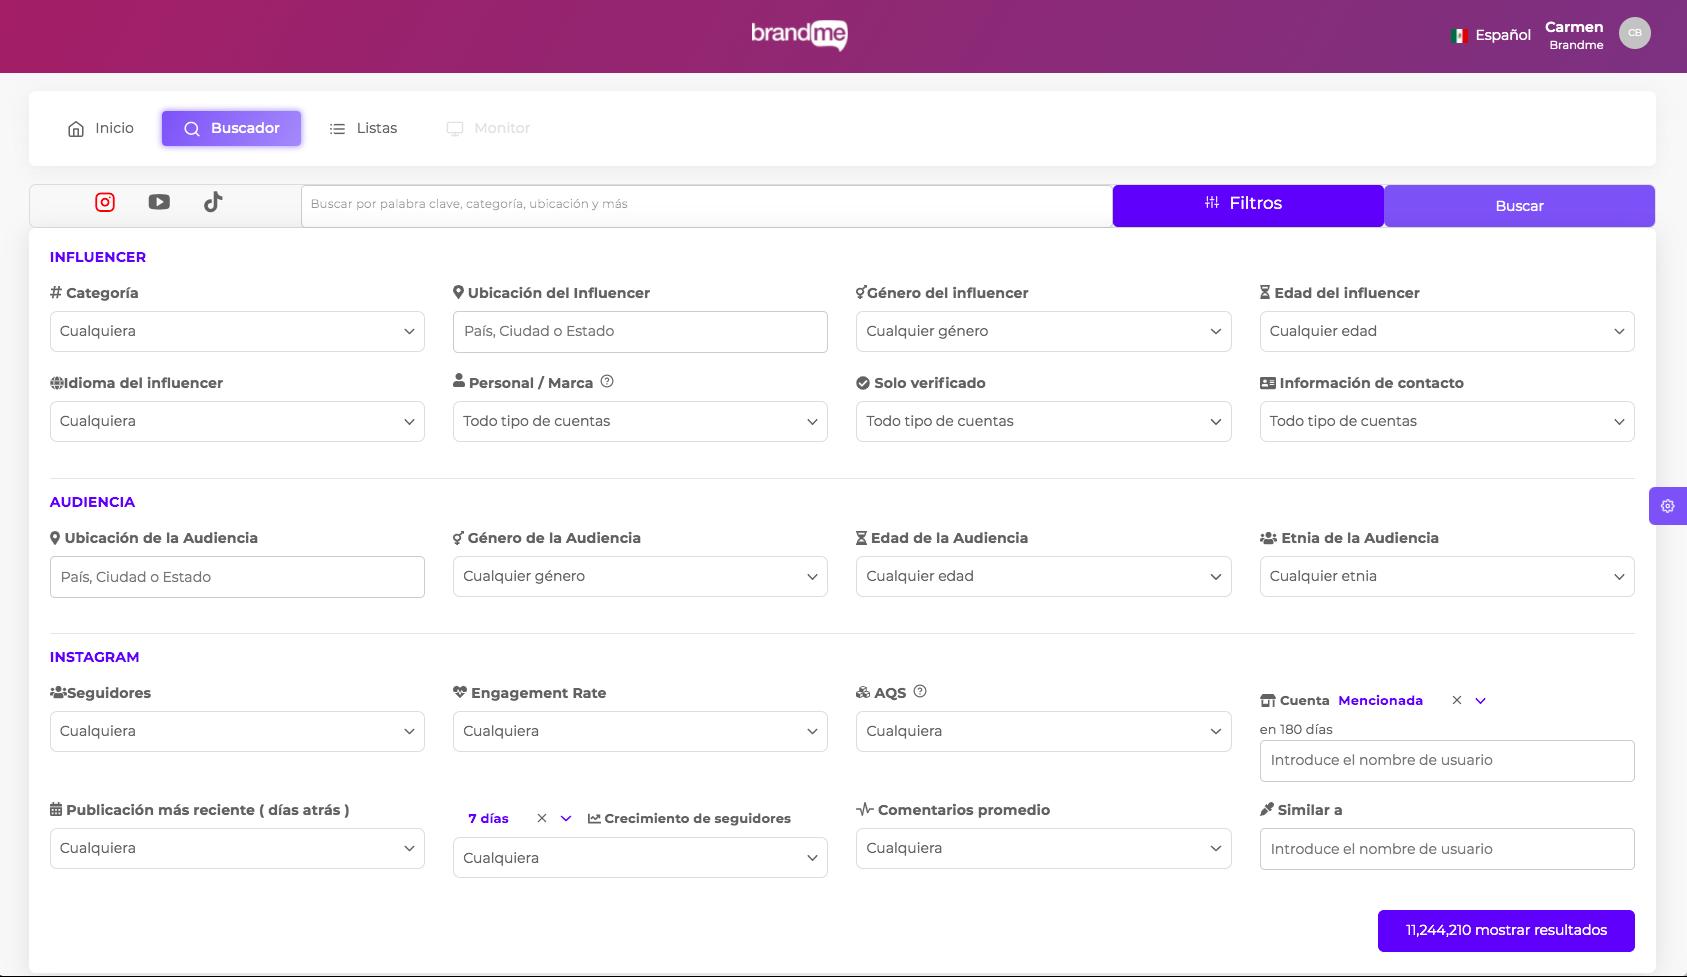 Cómo-elegir-influencers-analizador-de-BrandMe-métricas-buscador